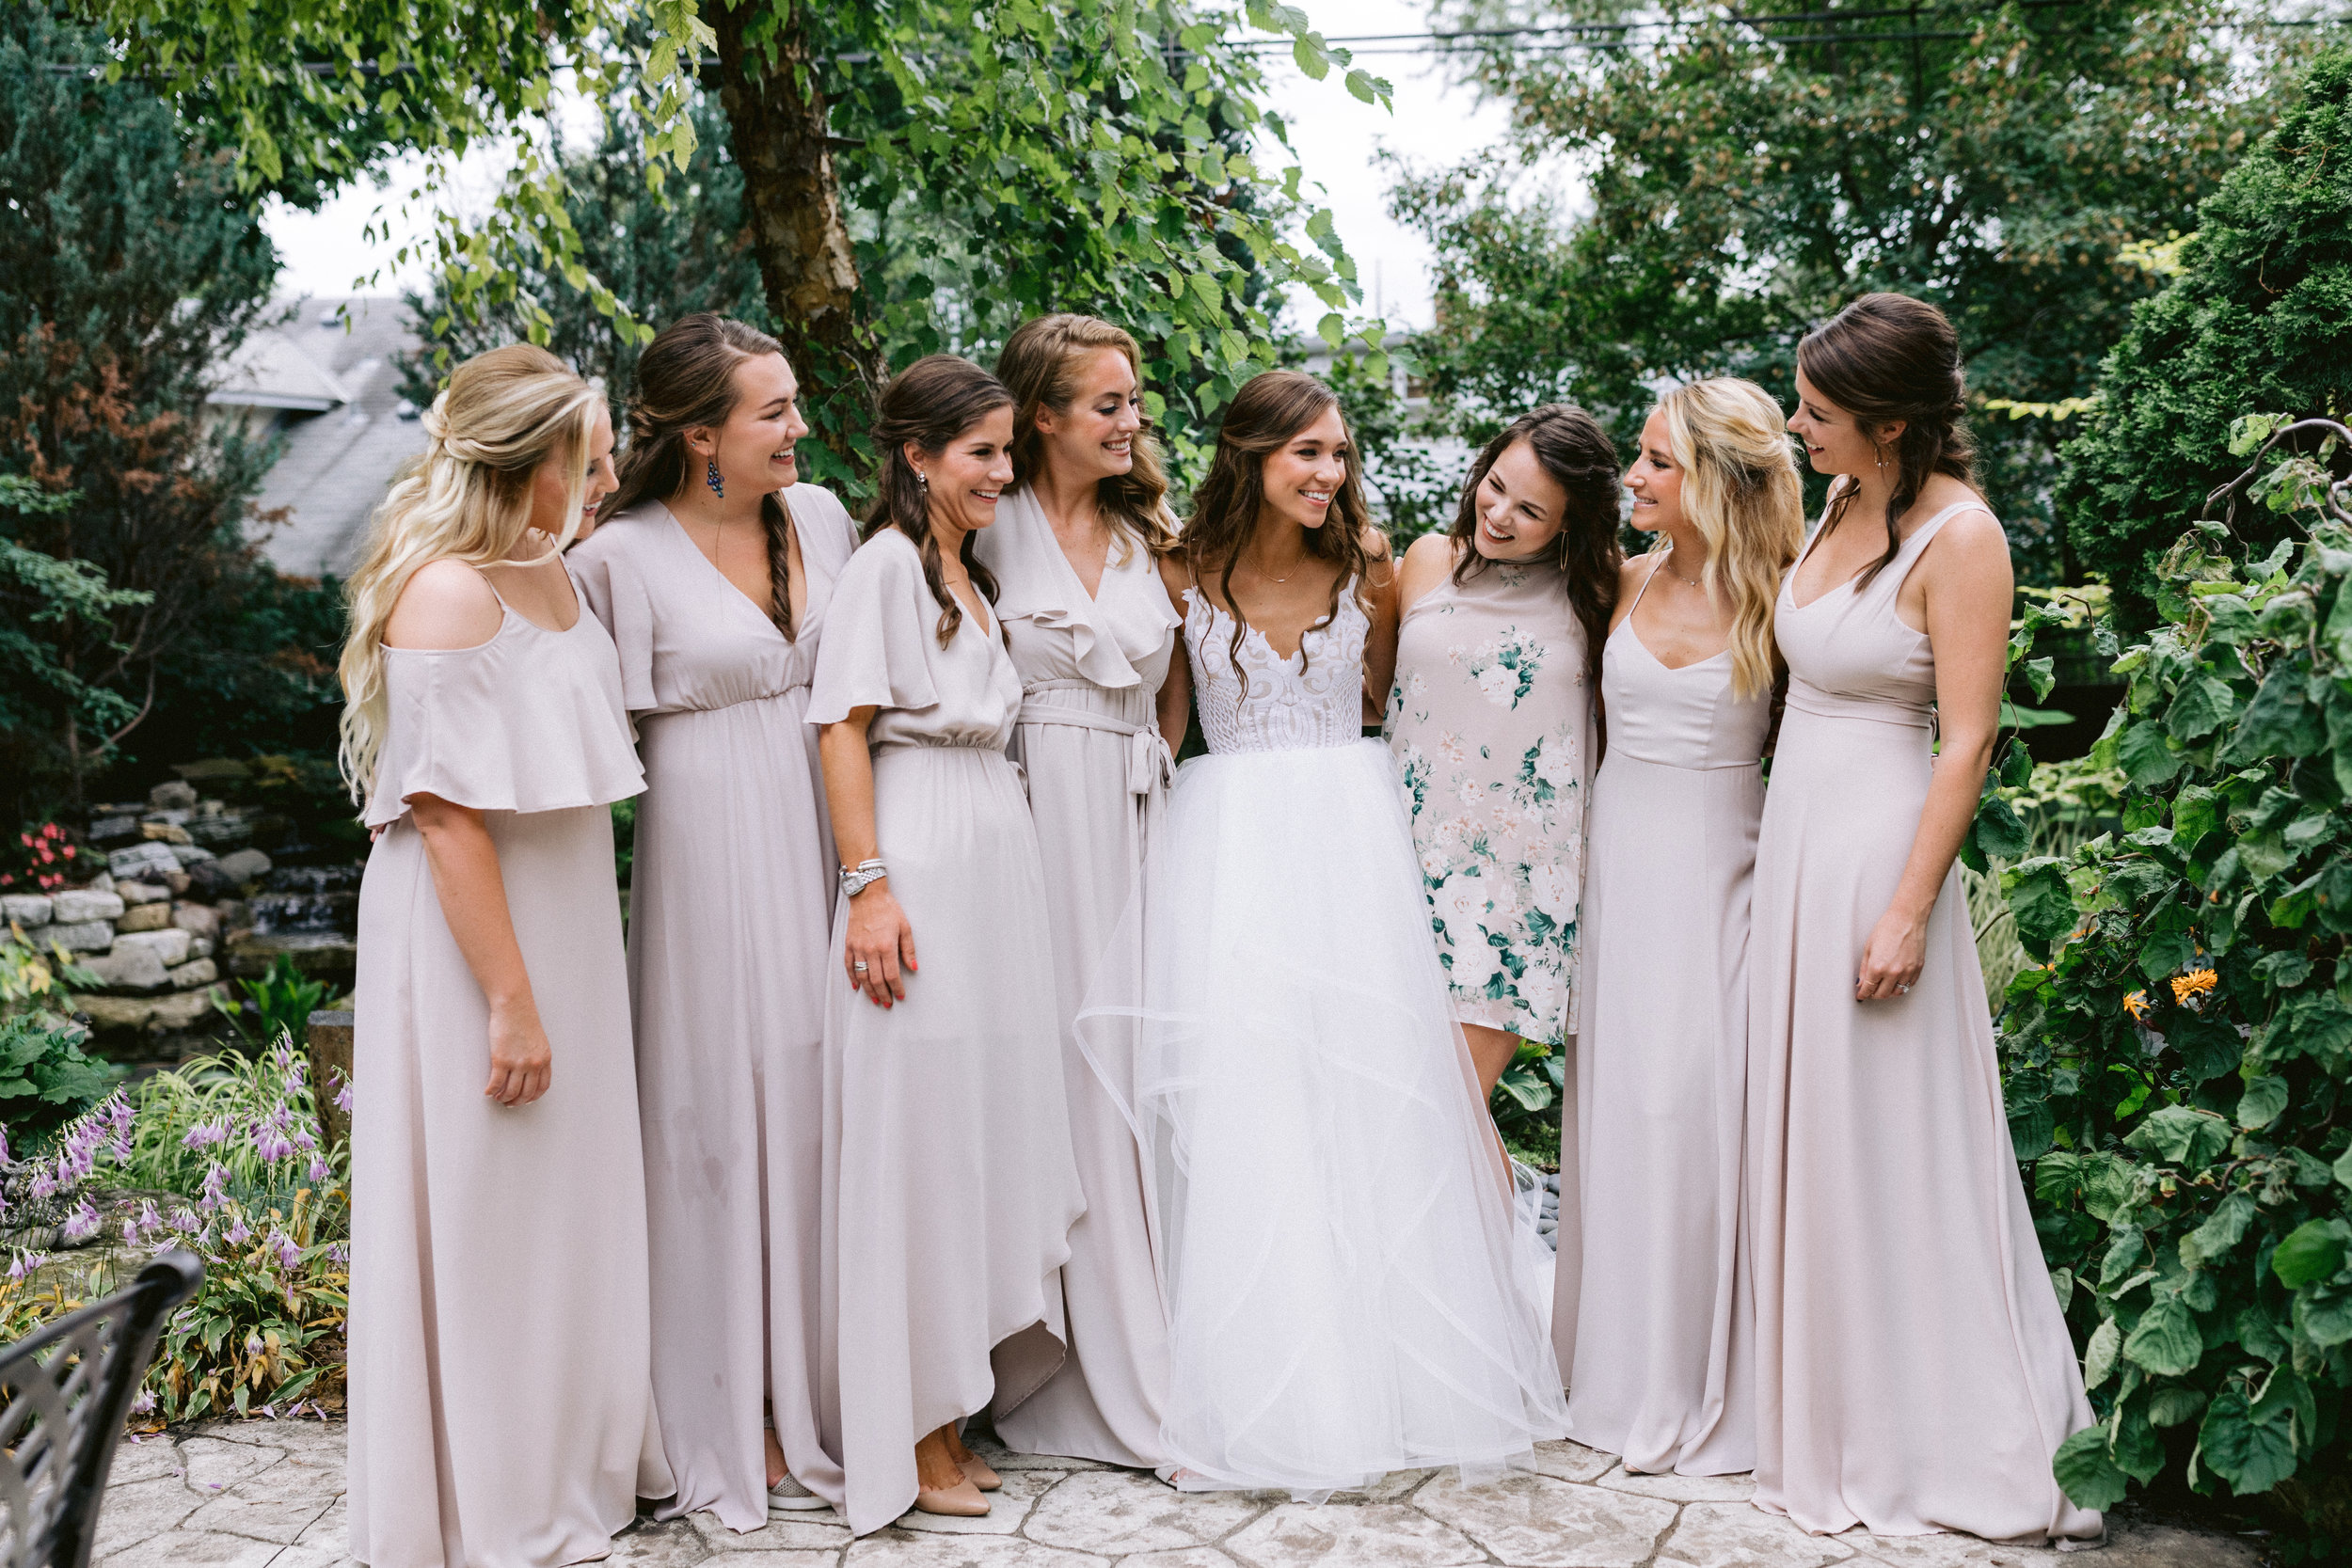 solarartsbychowgirlswedding-2.jpg